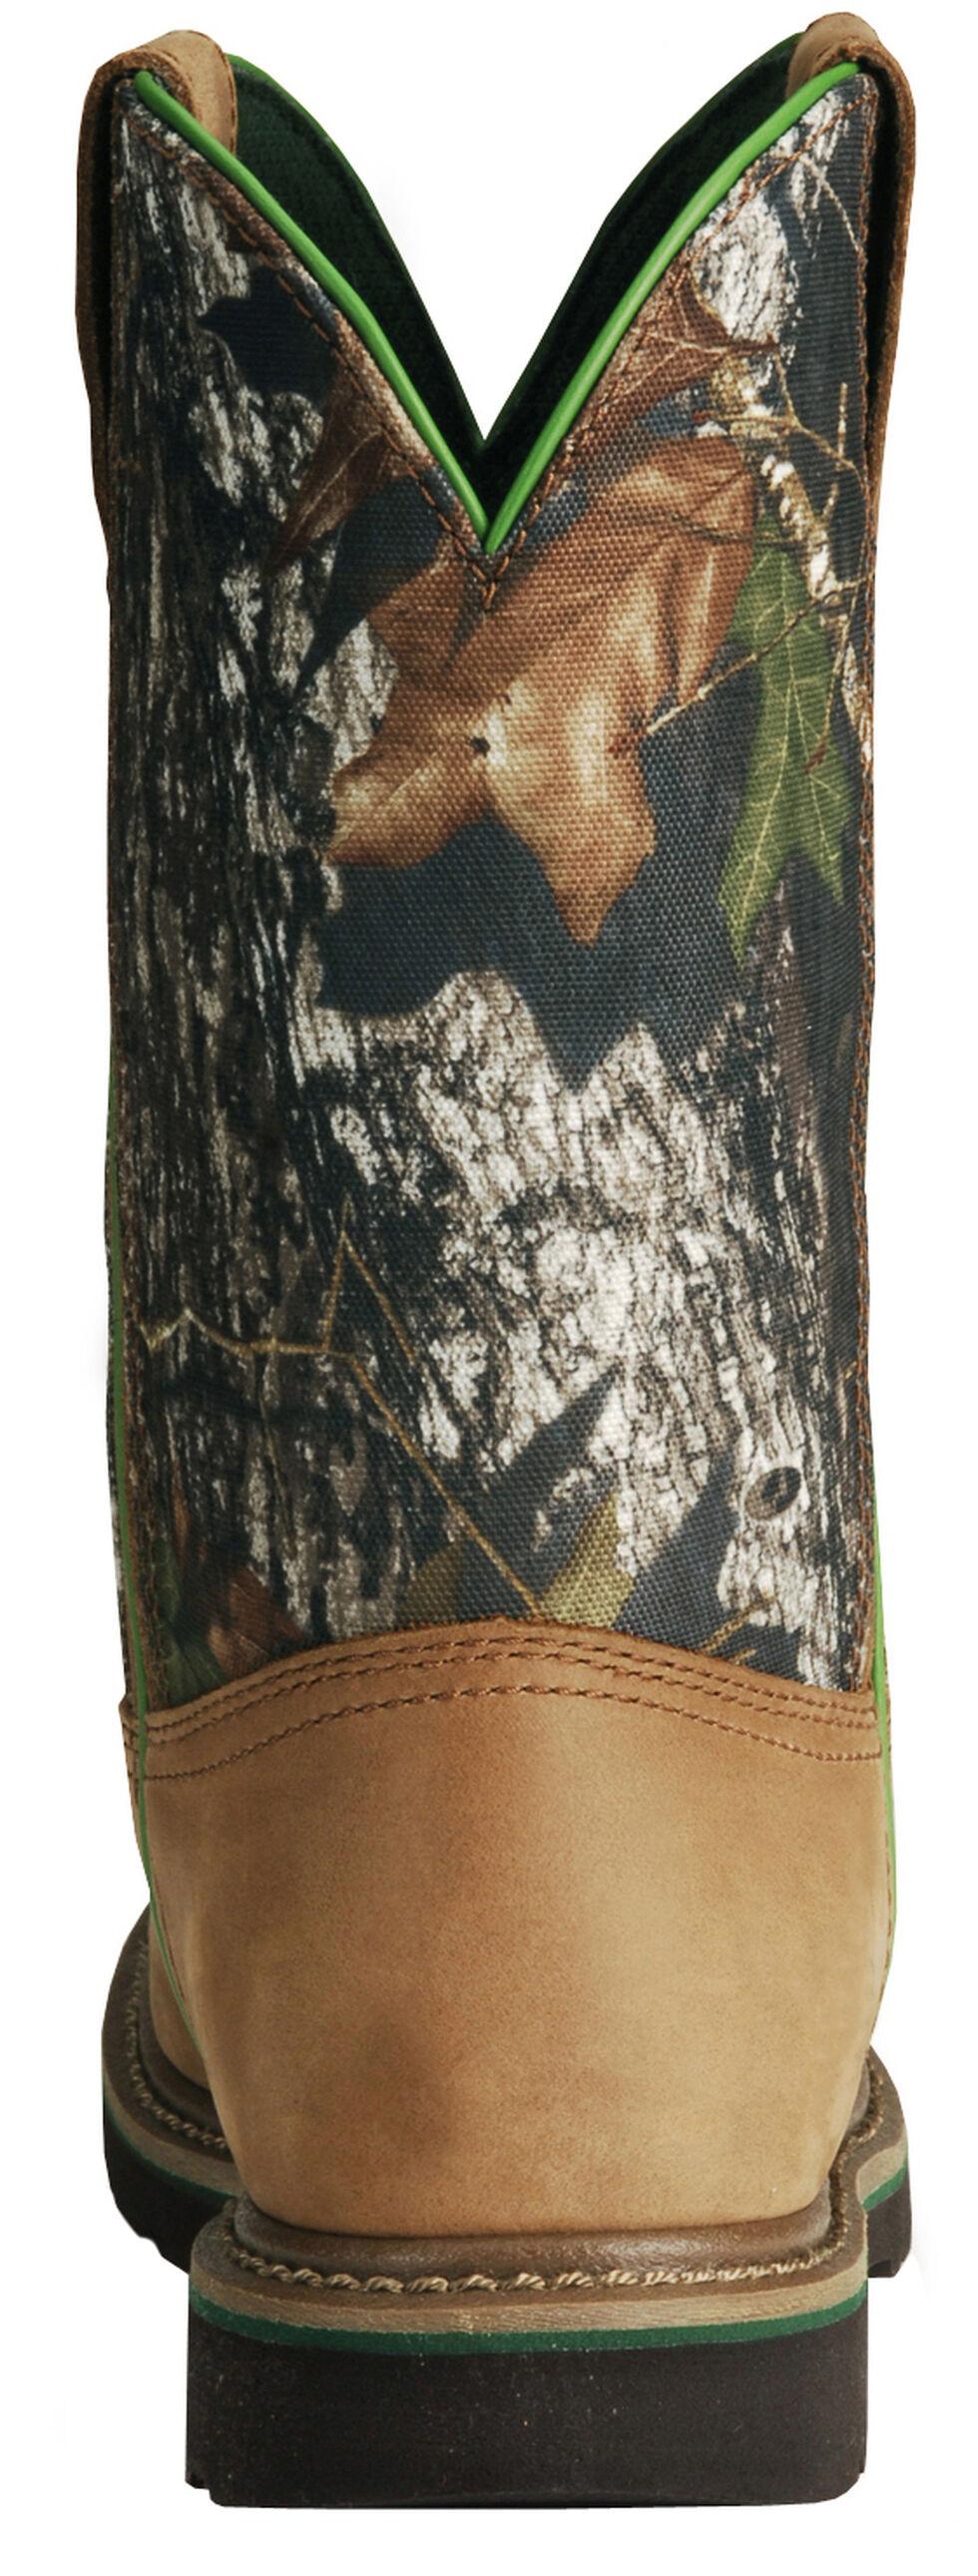 John Deere Mossy Oak Camo Wellington Work Boots - Steel Toe, Tan, hi-res